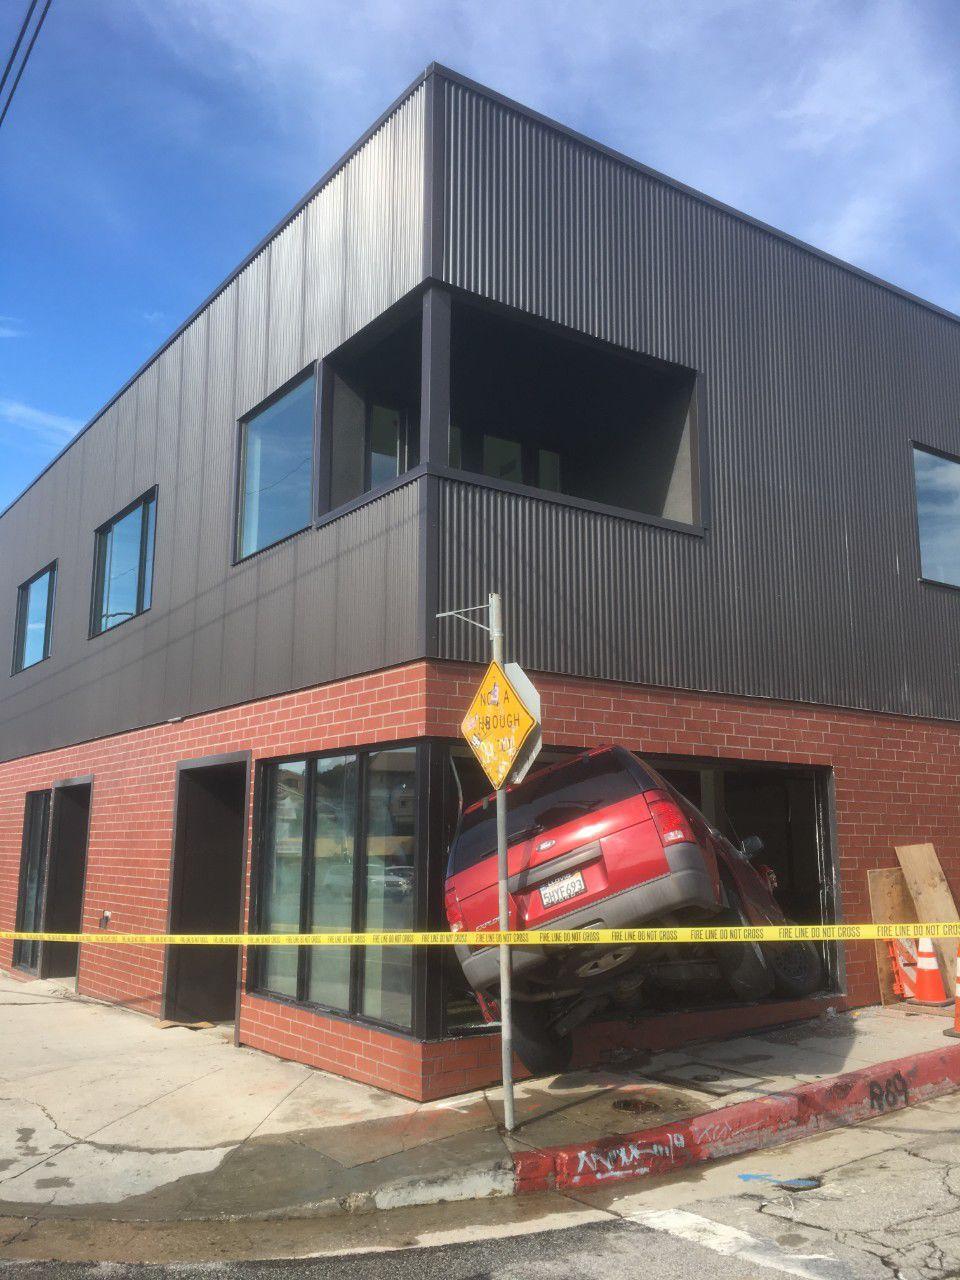 Ford Explorer Crashes into Echo Park Building